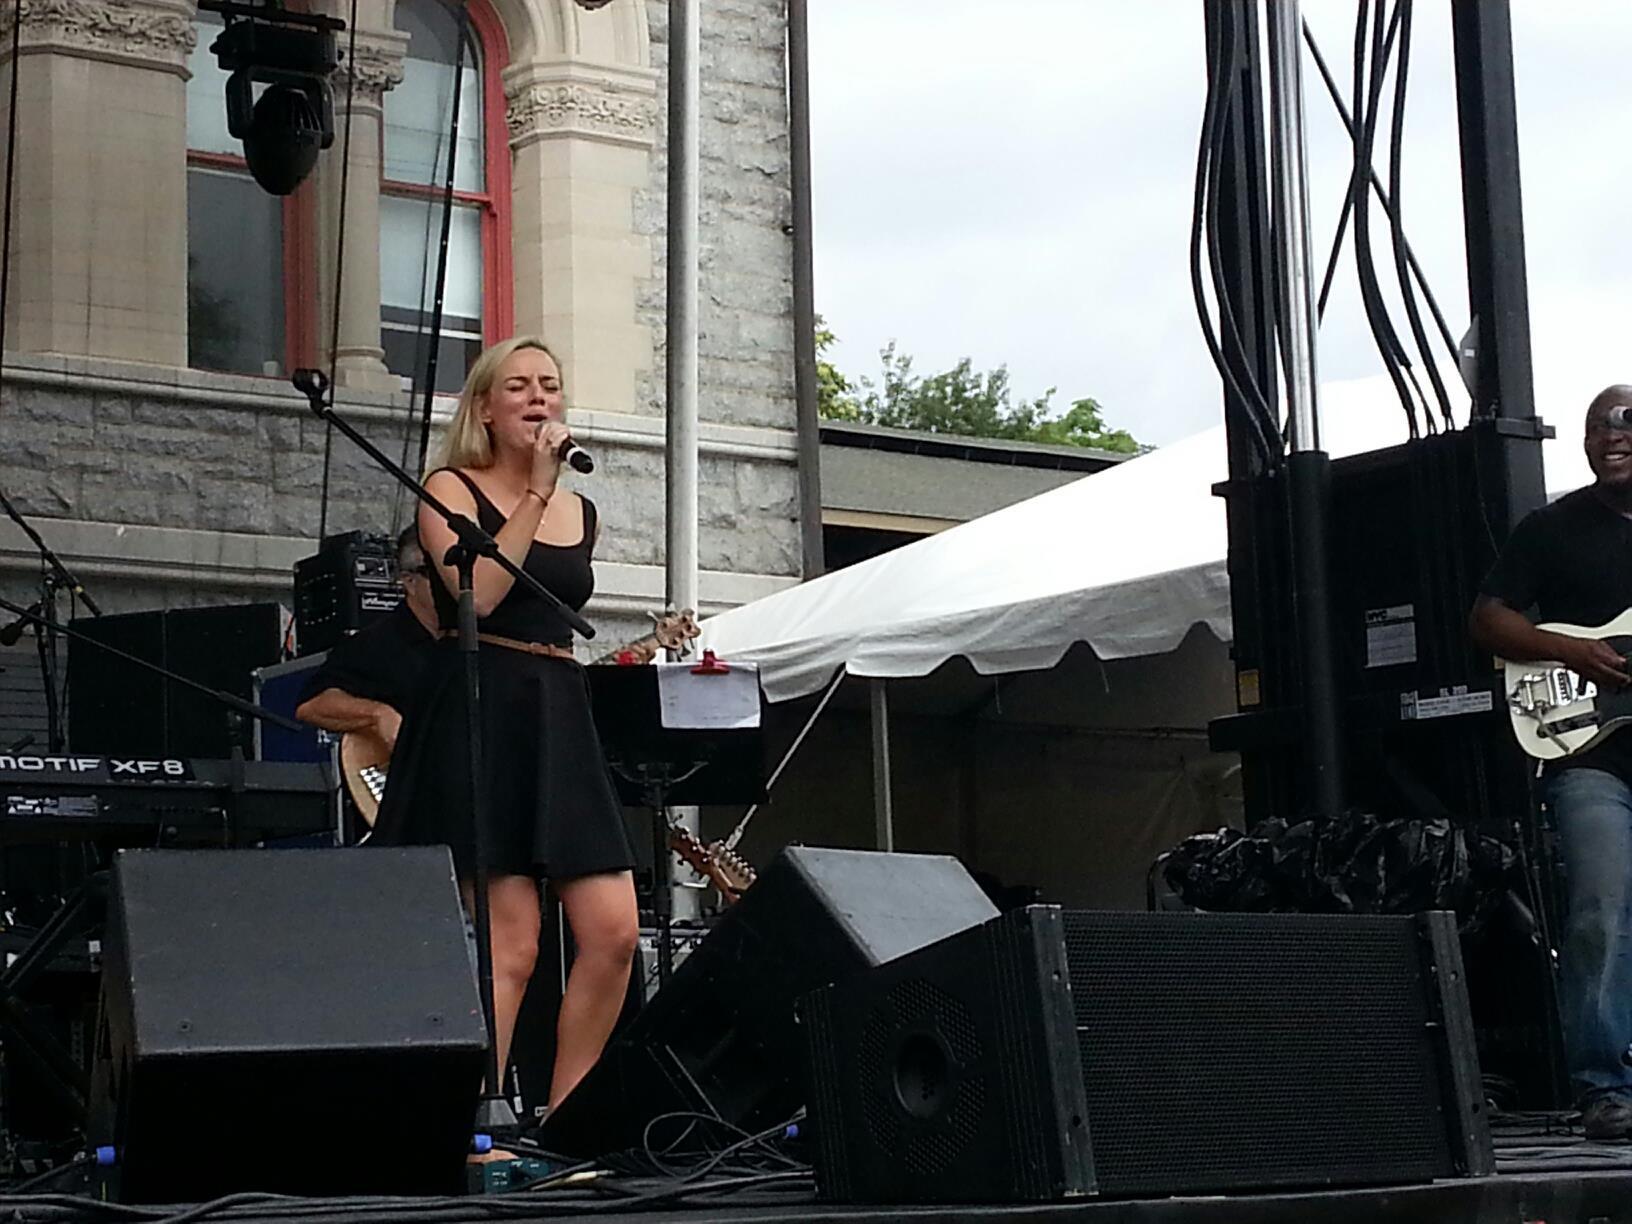 Emma White singing photo.jpg